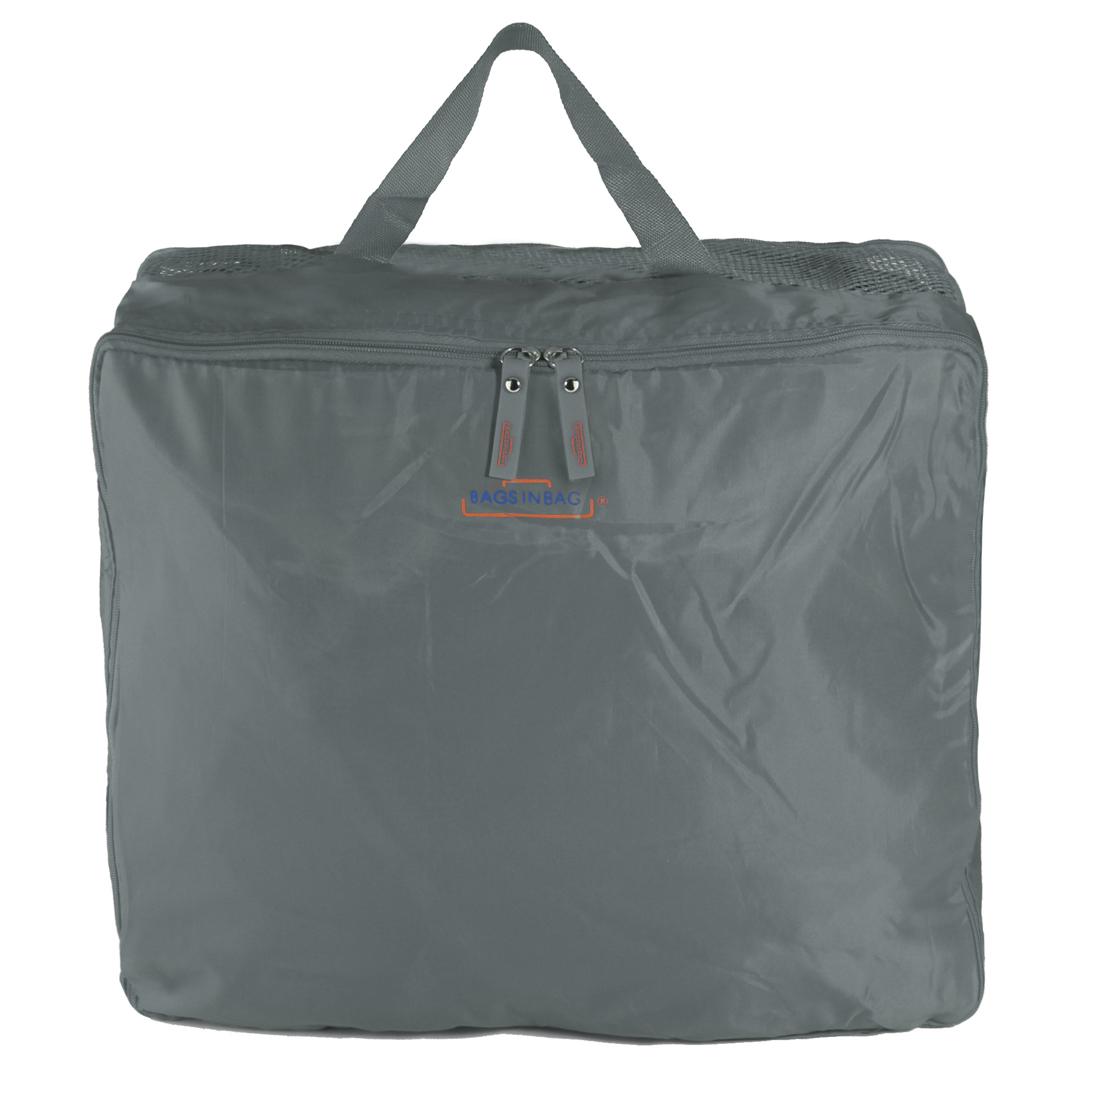 Neufu 5pcs sac de rangement toilette bagage valise voyage - Astuce rangement sac a main ...